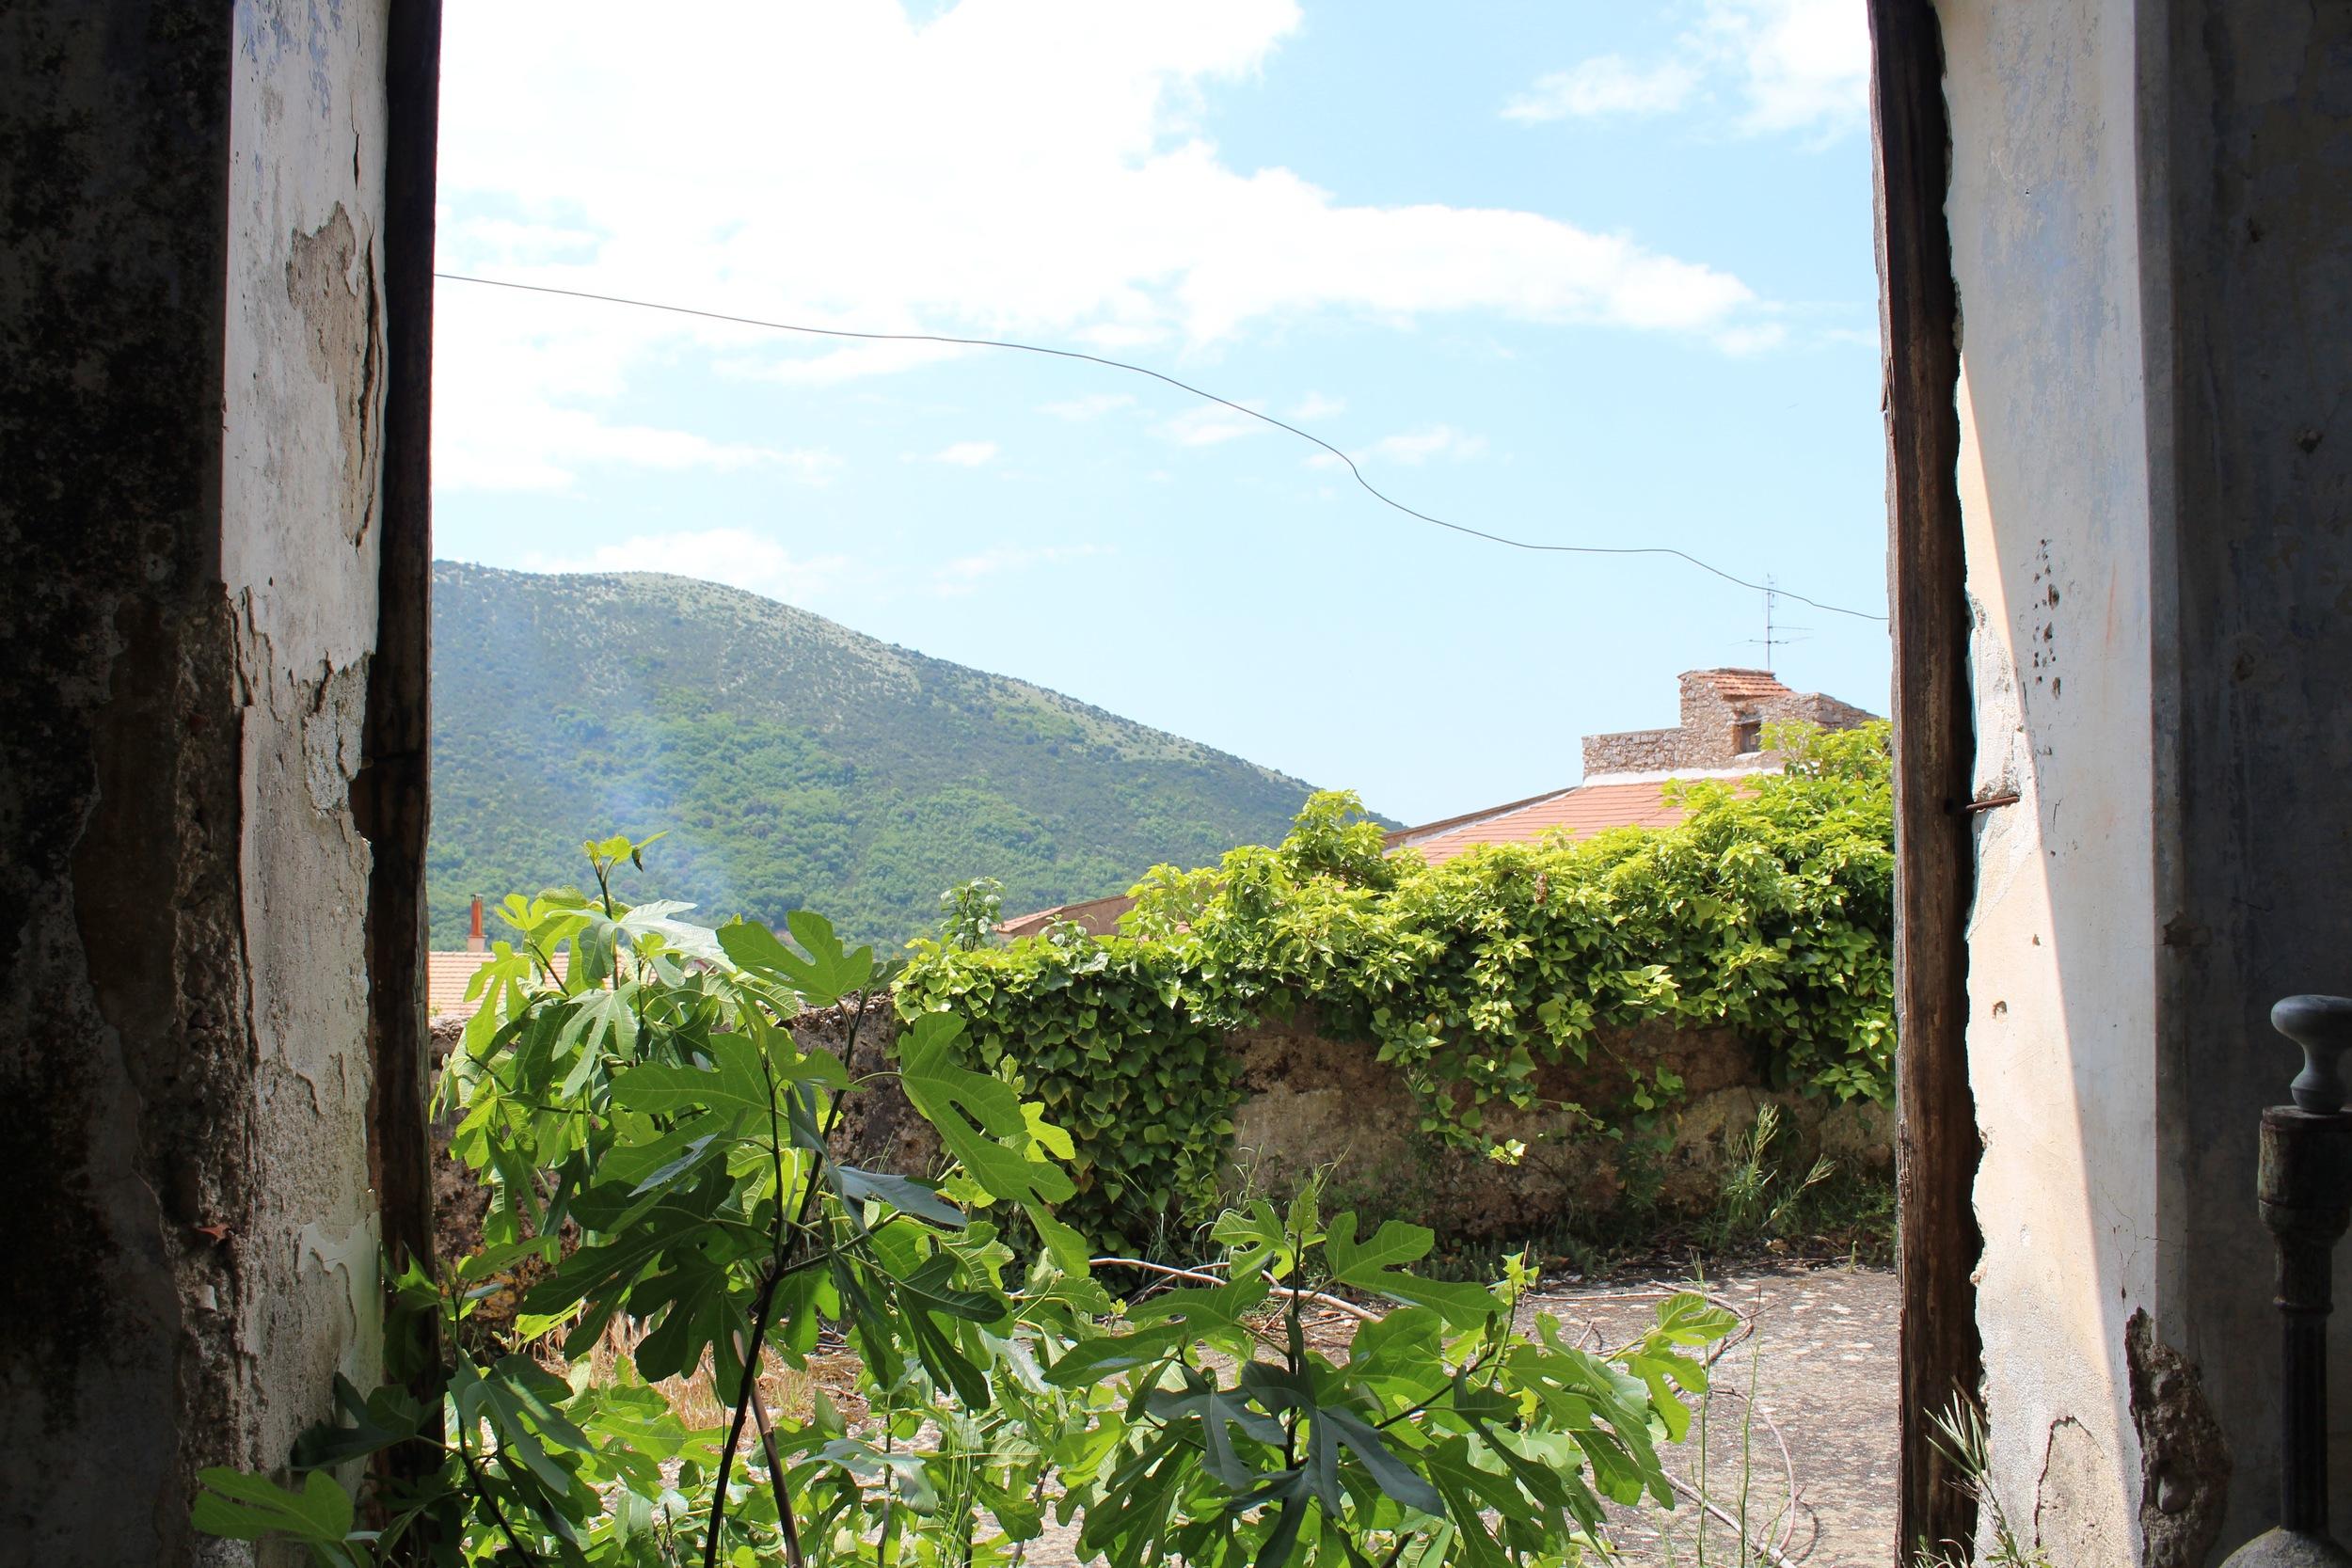 The gardens and orchard outside Palazzo Bellelli Photo credit: Danielle Oteri